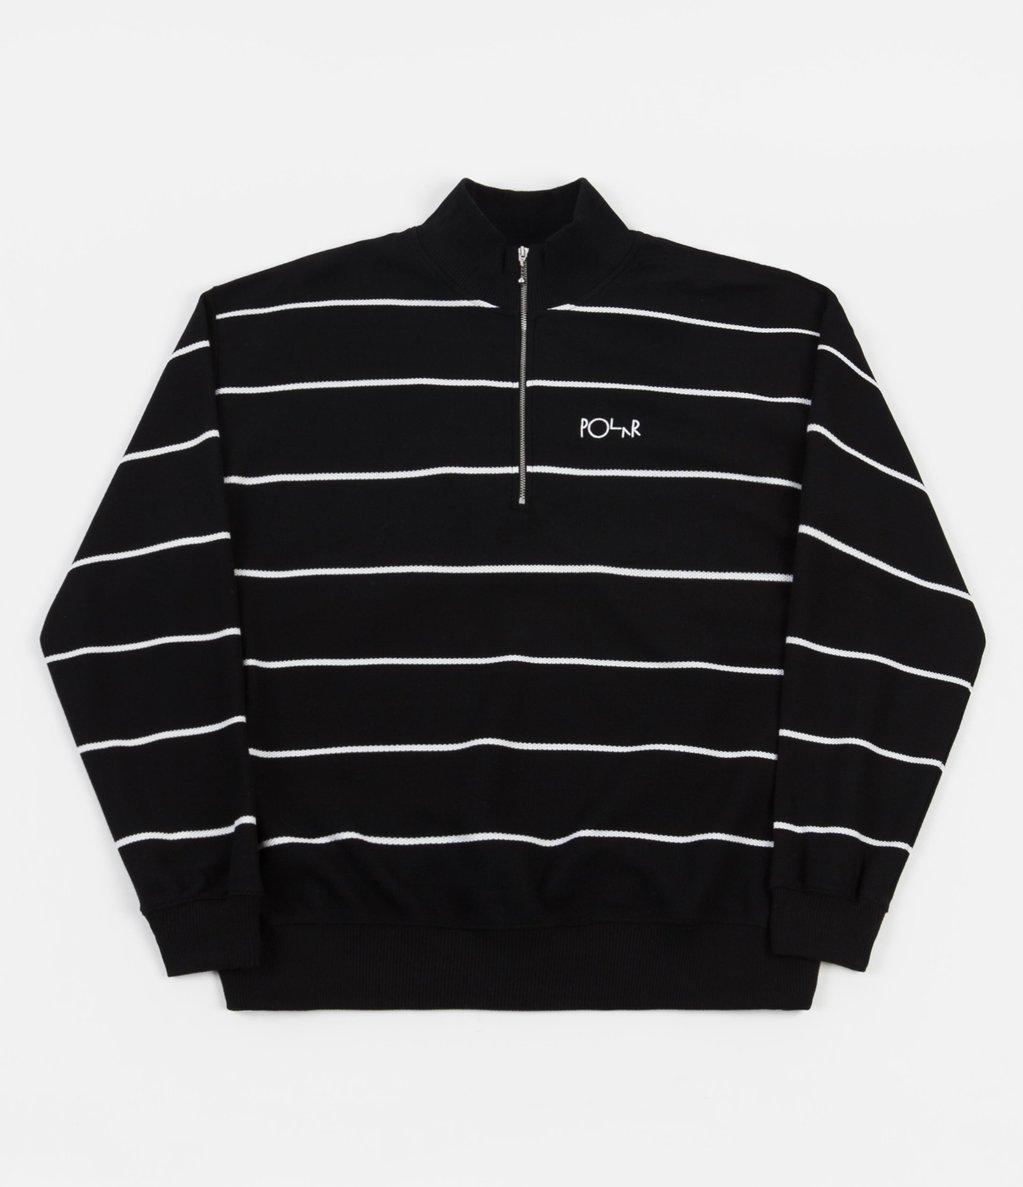 Polar Stripe Zip Neck Sweatshirt - Black